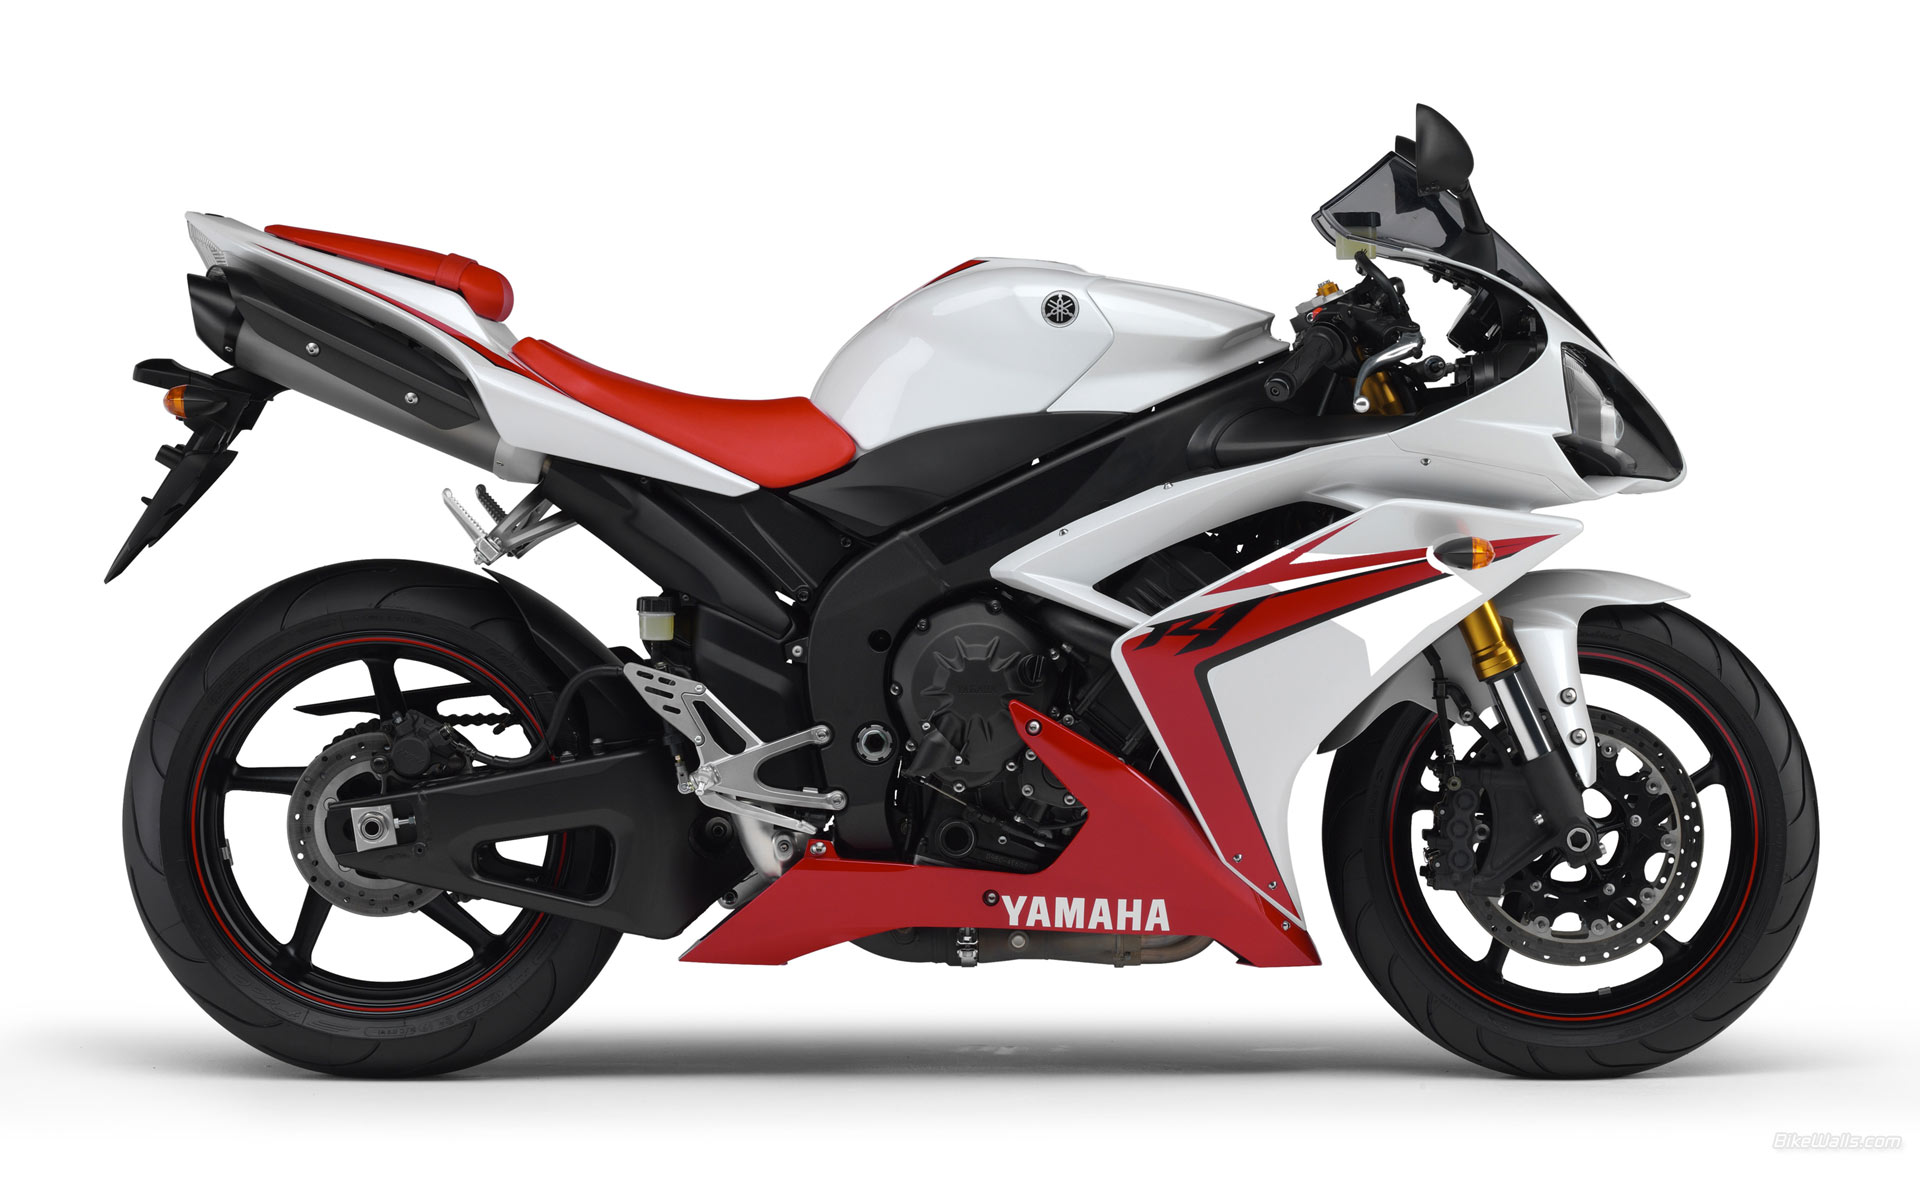 2010 Yamaha R1 Wallpaper 6740 Hd Wallpapers in Bikes   Imagescicom 1920x1200